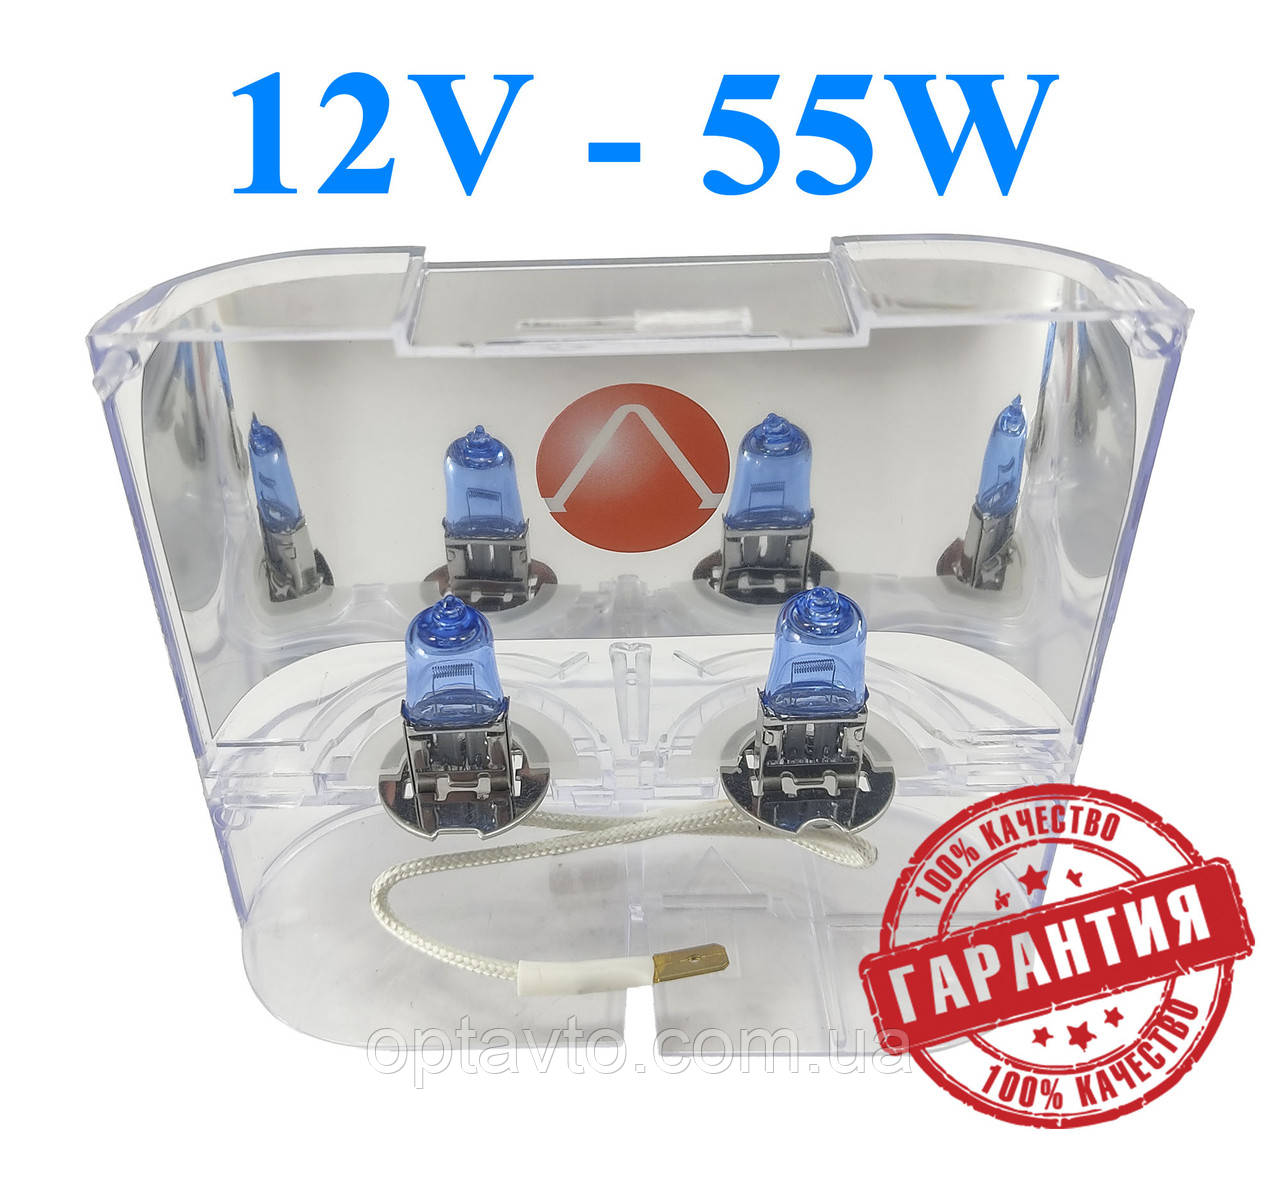 Xenon Vision Лампы H-3 12V 55W P14,5S NLXV Лампы с эффектом ксенона Cool Blue Intense + 30%